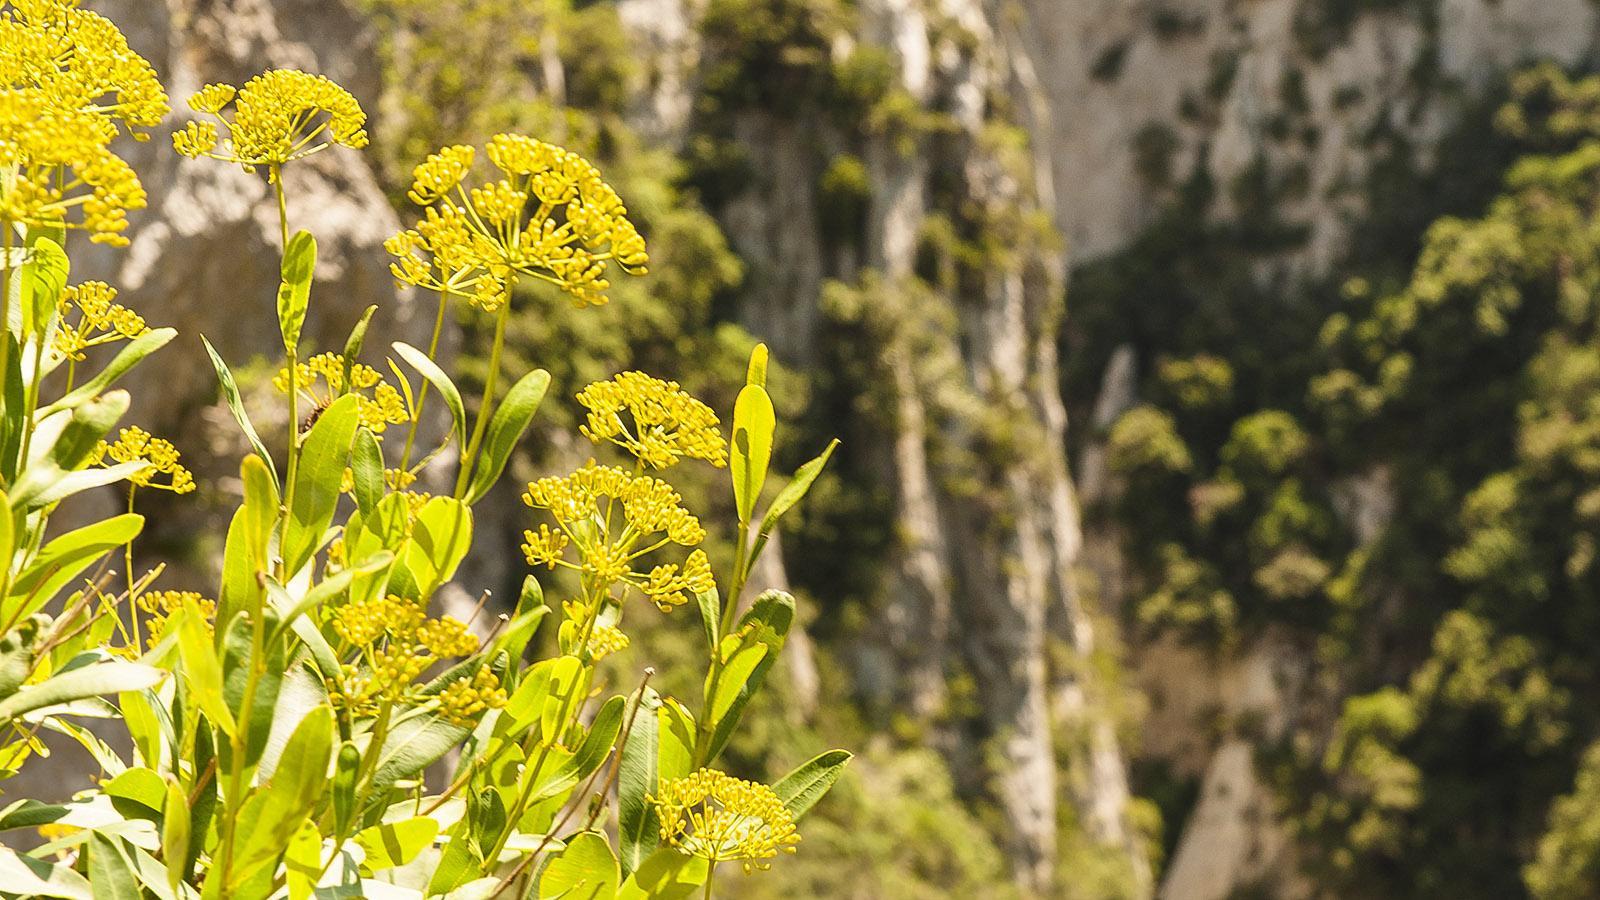 Gorges de Galamus: Pflanzen krallen sich an den Fels. Foto: Hilke Maunder